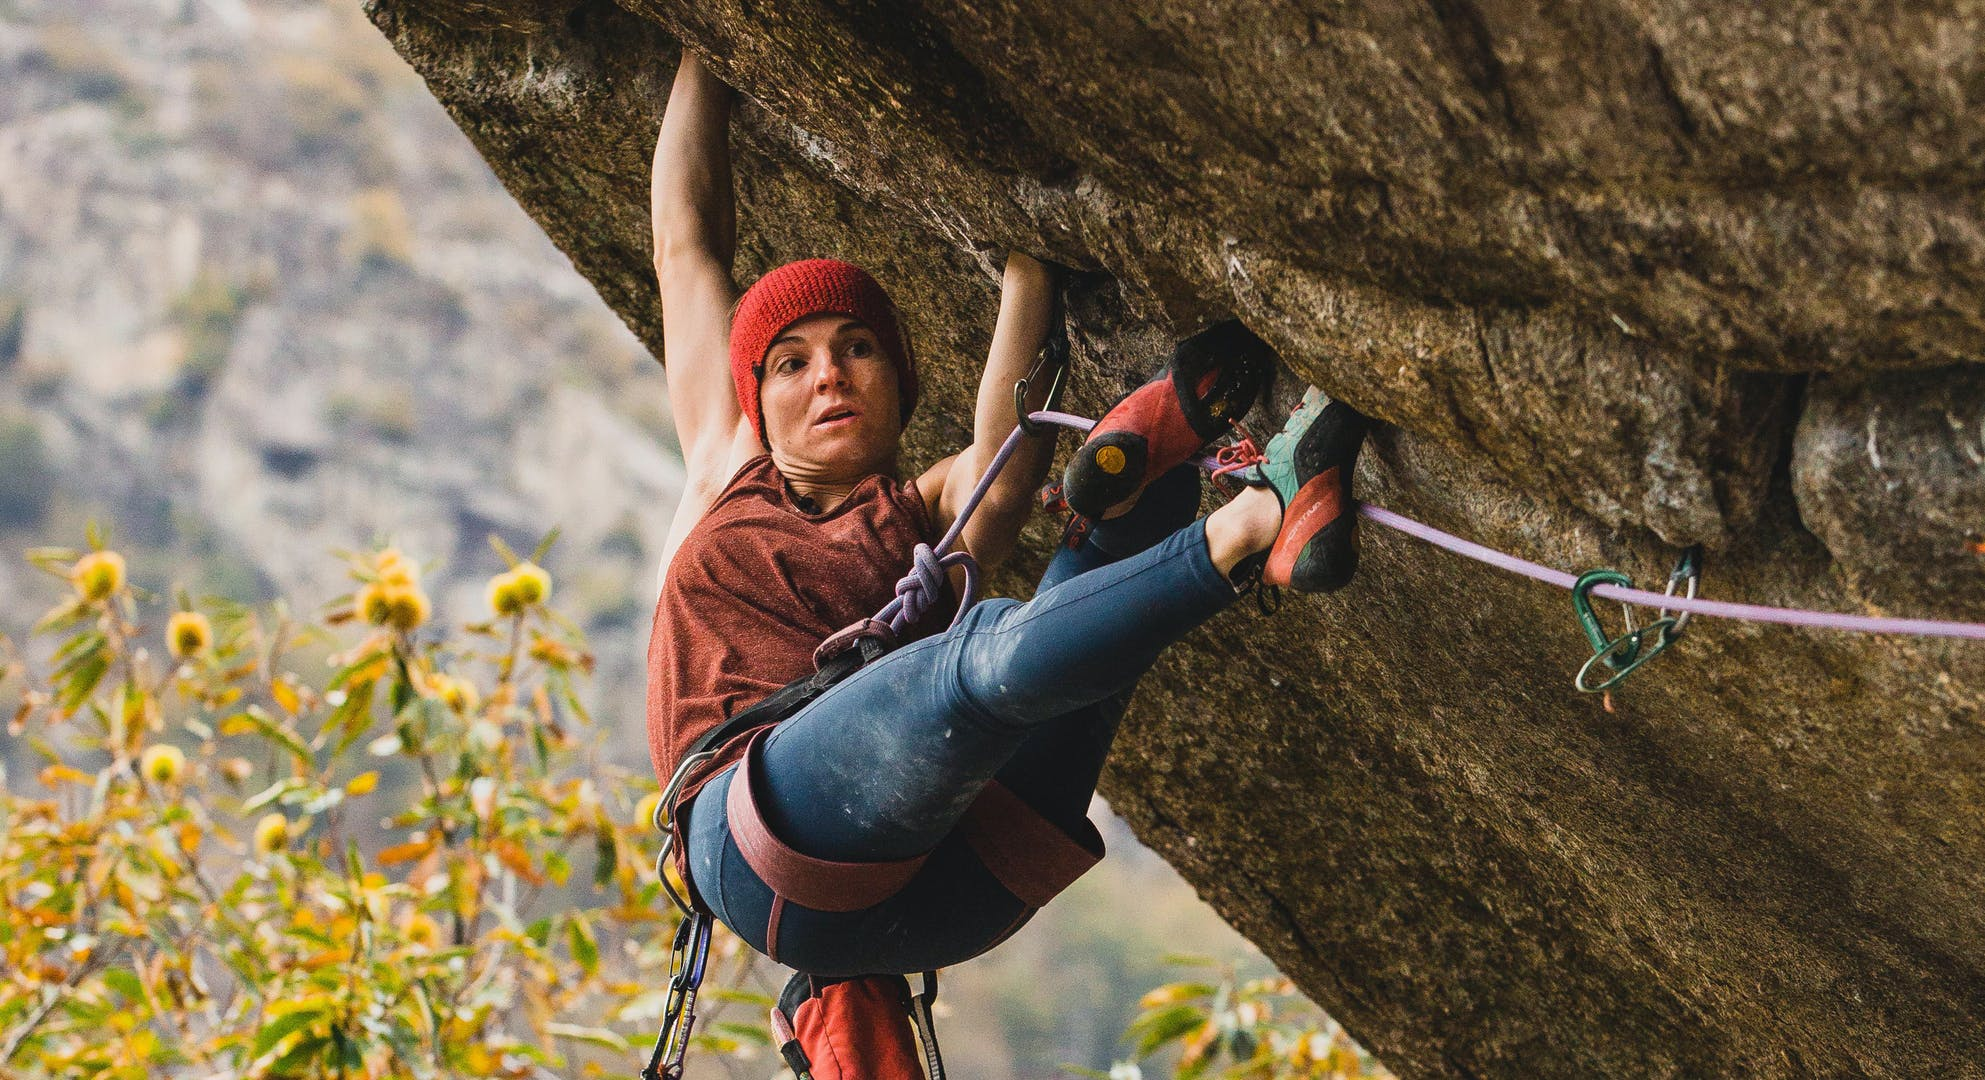 Black Diamond athlete Babsi Zangerl climbing Greenspit